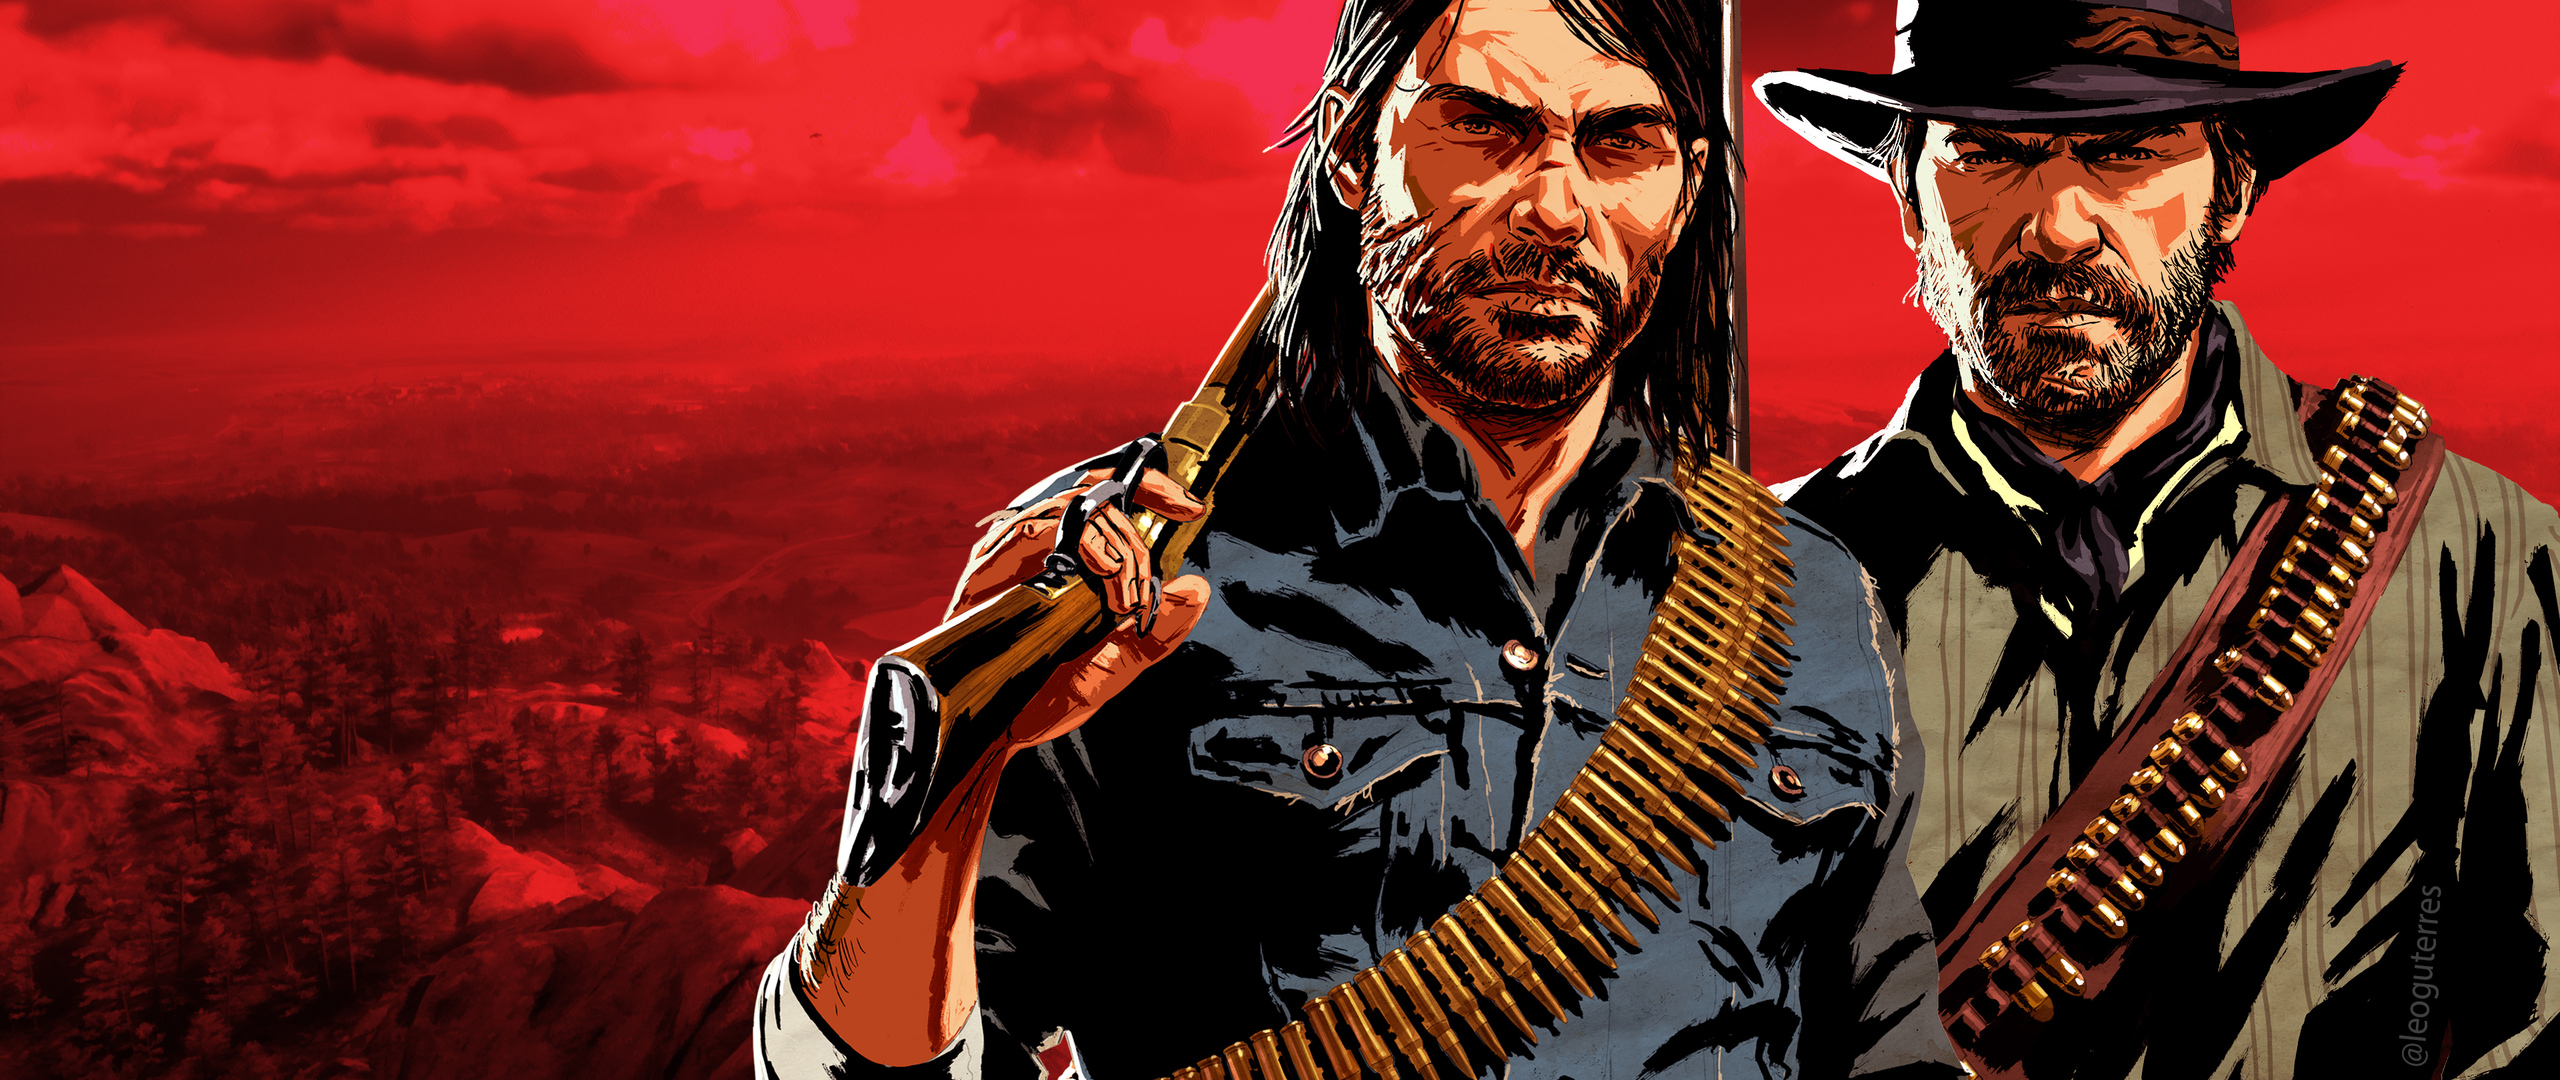 2560x1080 2020 Red Dead Redemption In 2 4k 2560x1080 ...